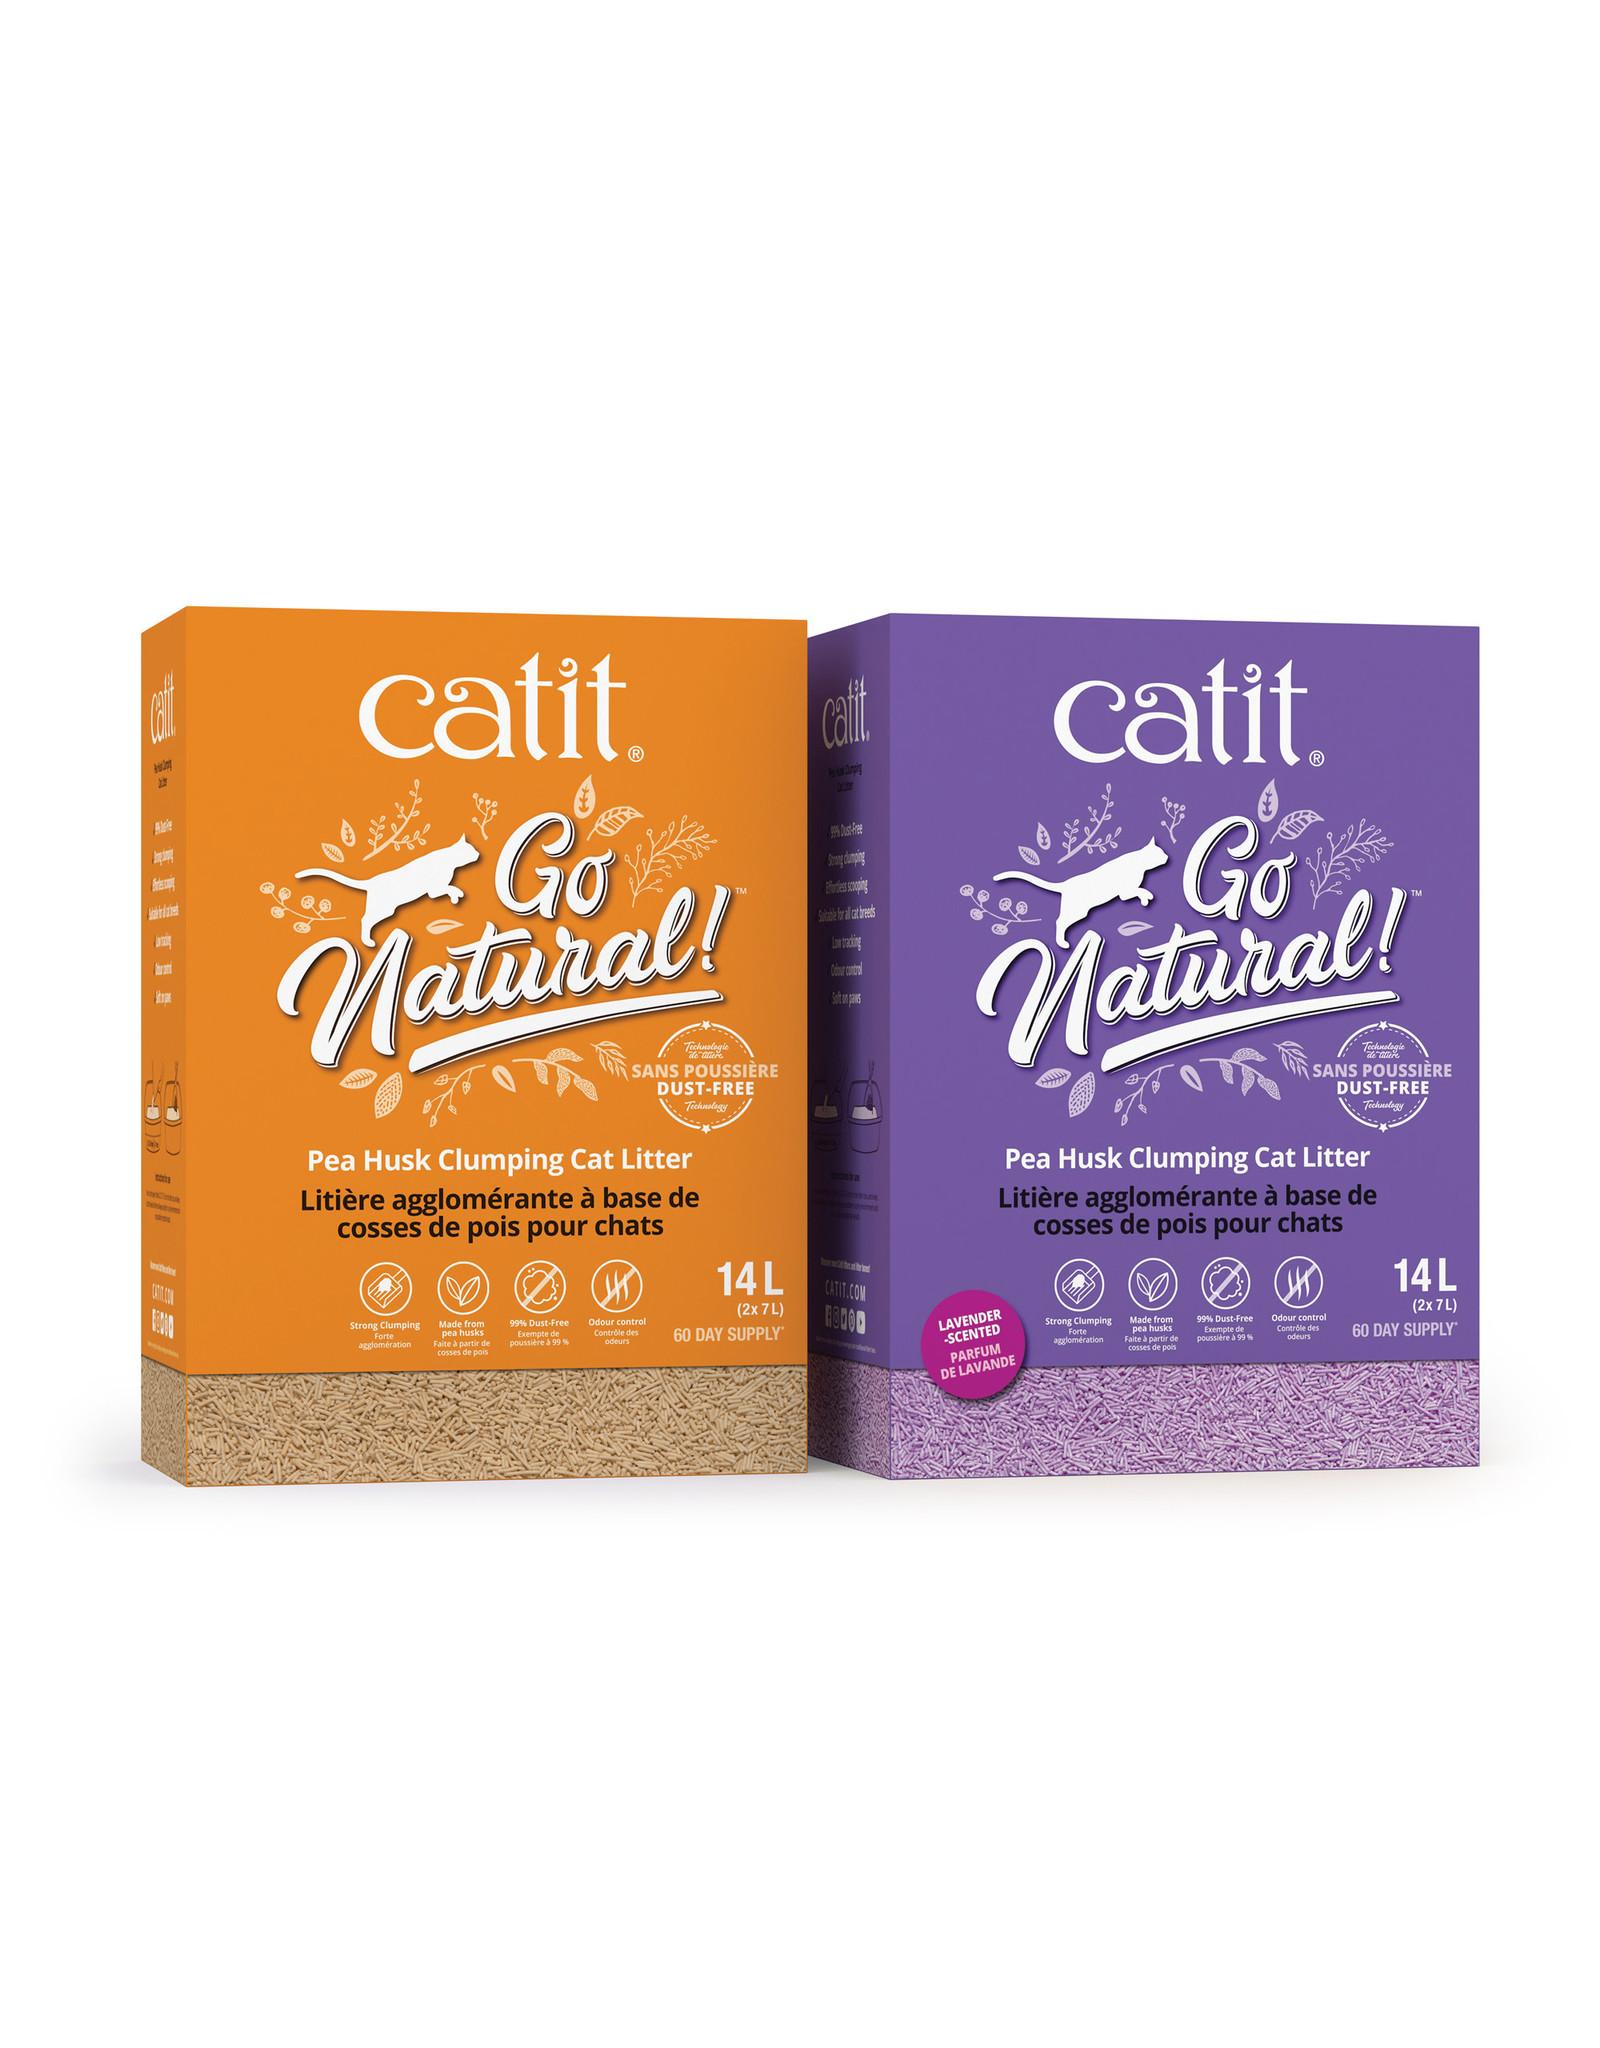 CatIt Go Natural! Pea Husk Clumping Cat Litter - Lavender 14L